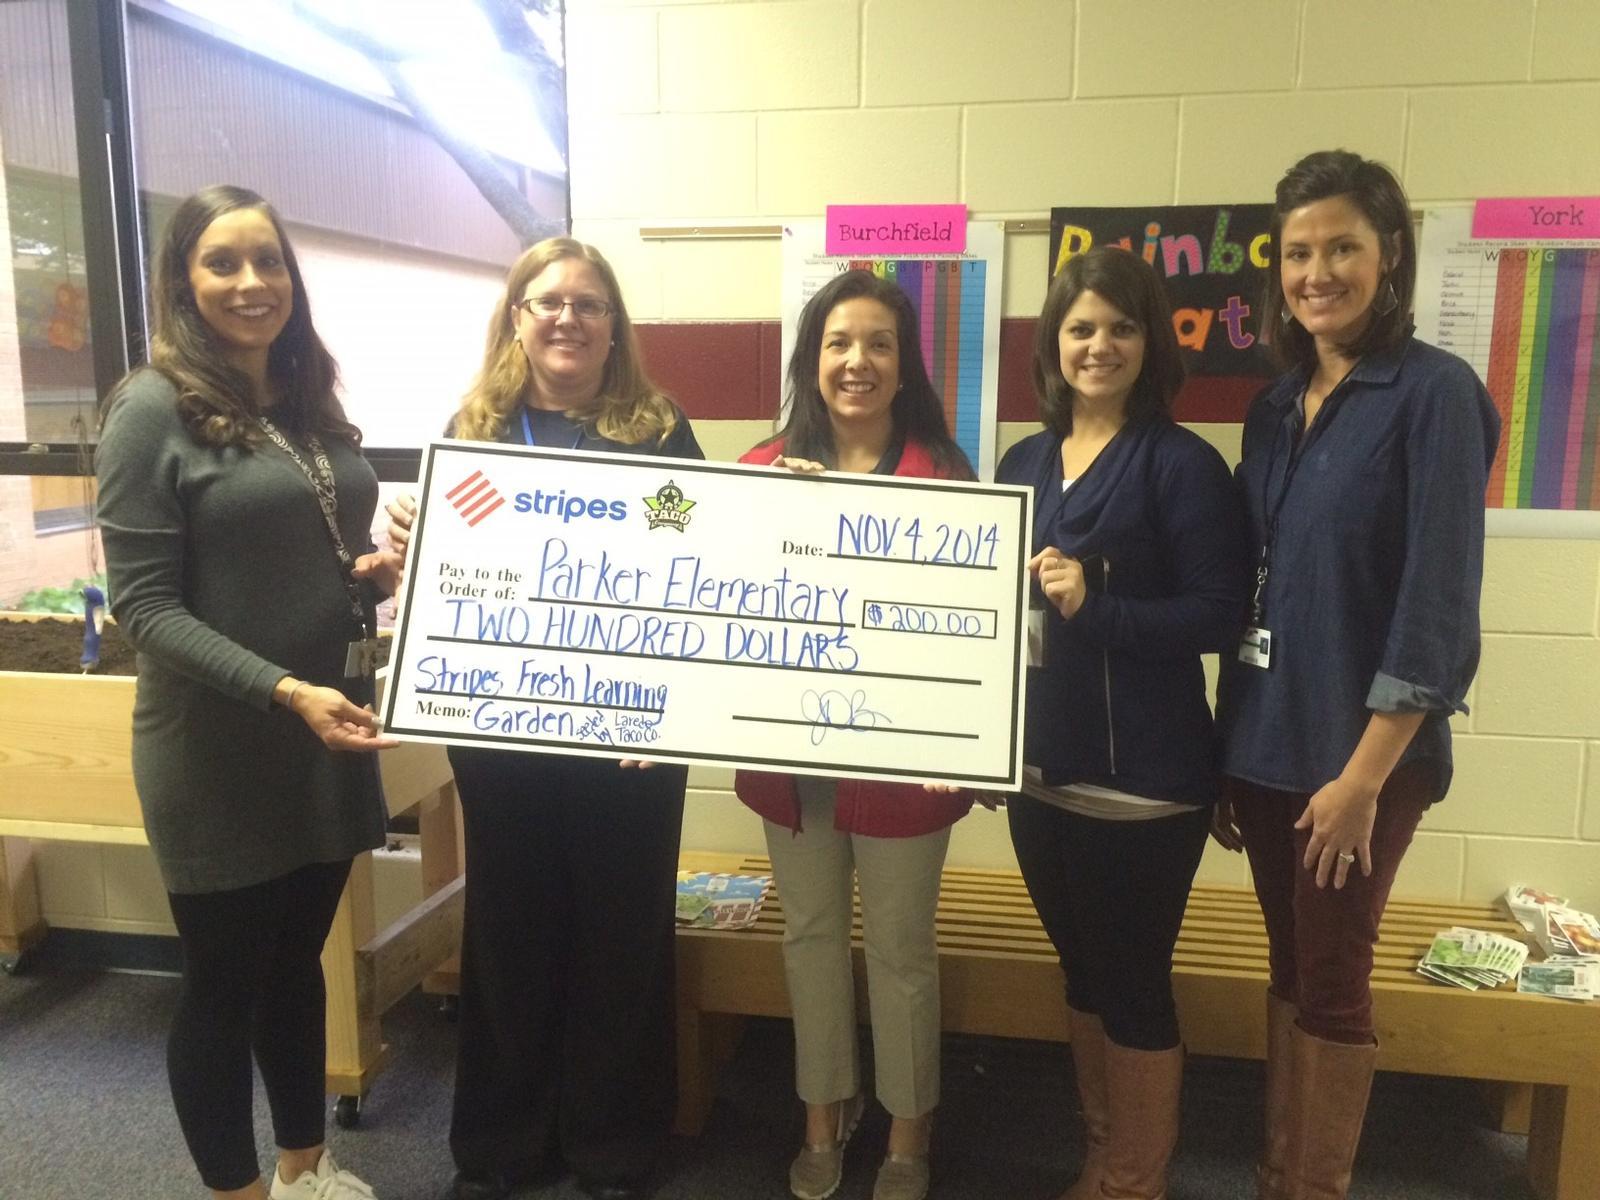 Midland Texas News >> Parker Elementary School In Midland Tx Receives The Stripes